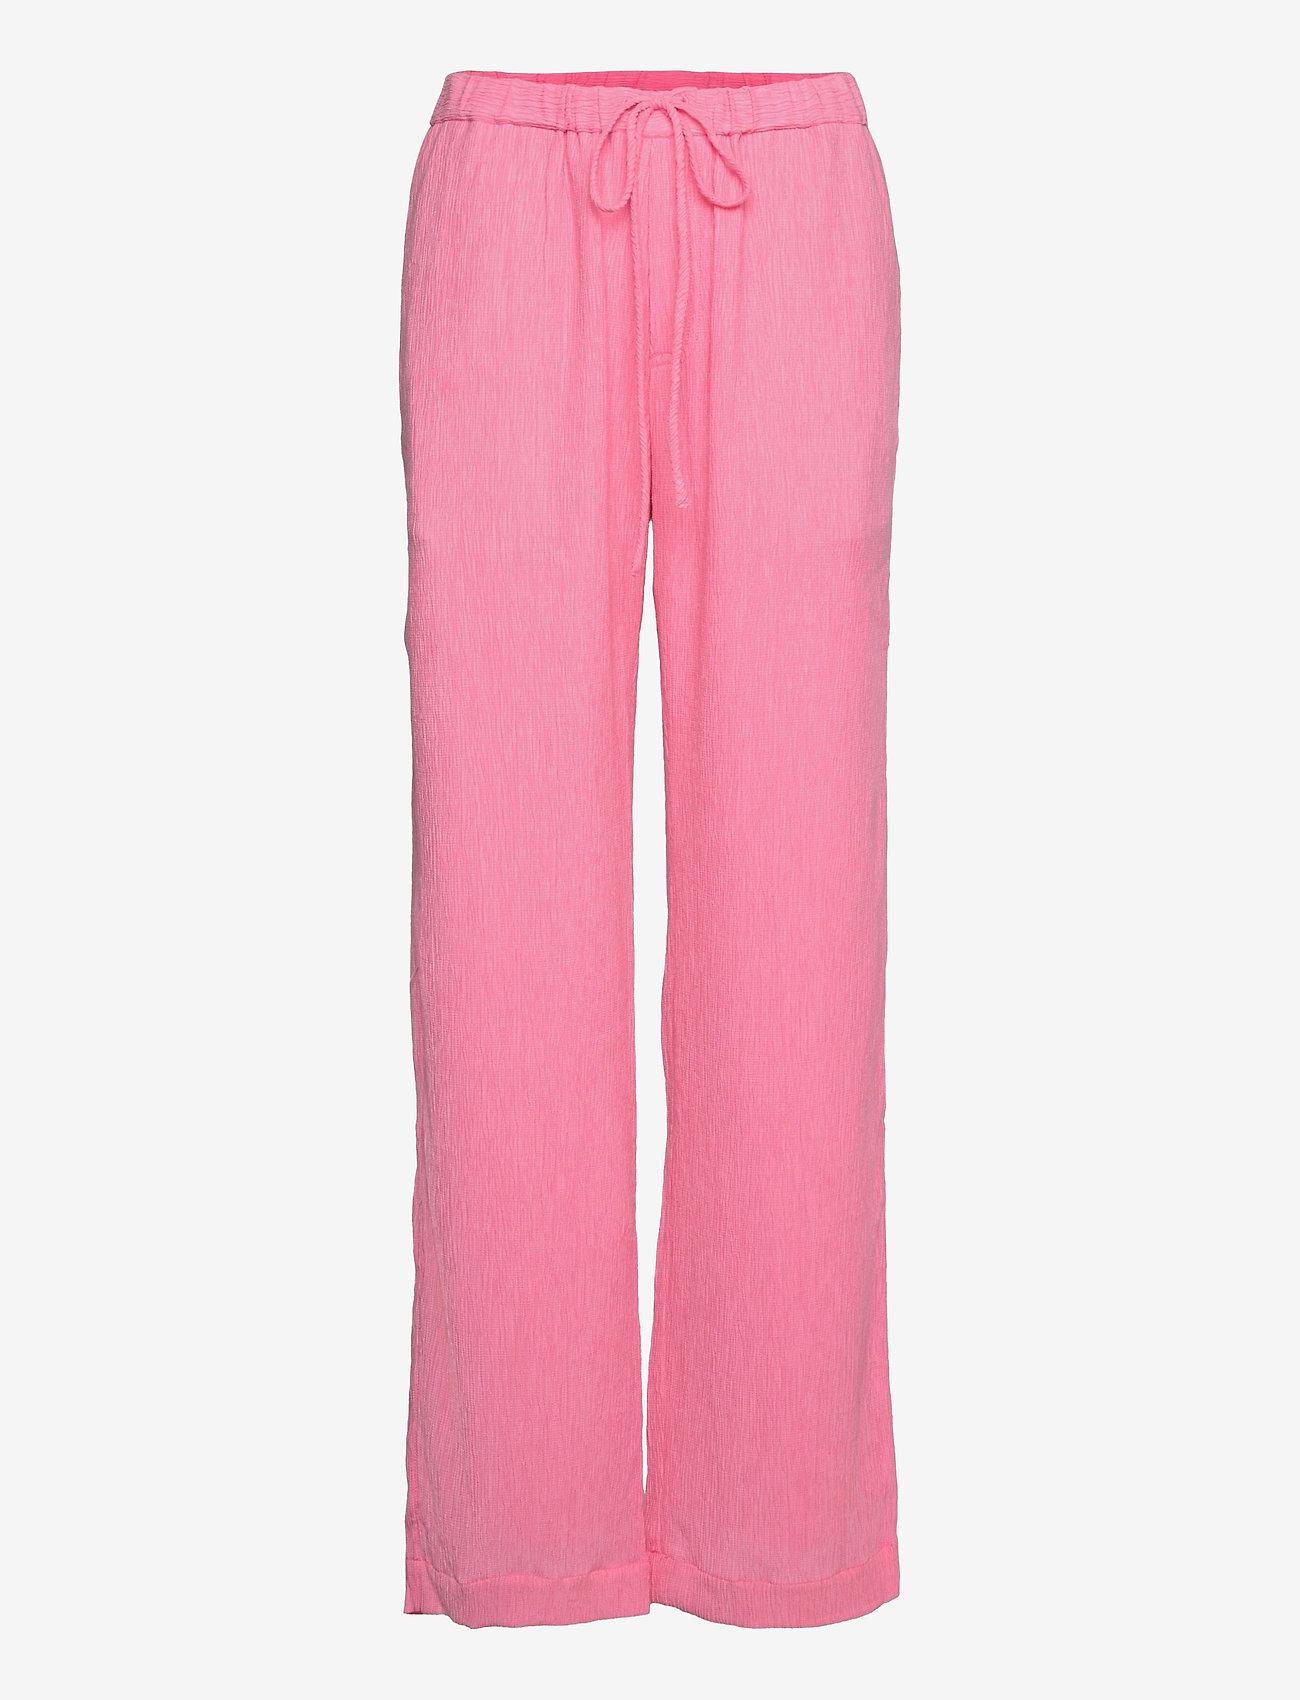 STINE GOYA - Gulcan, 1213 Crinkled Tencel - casual bukser - pink - 0